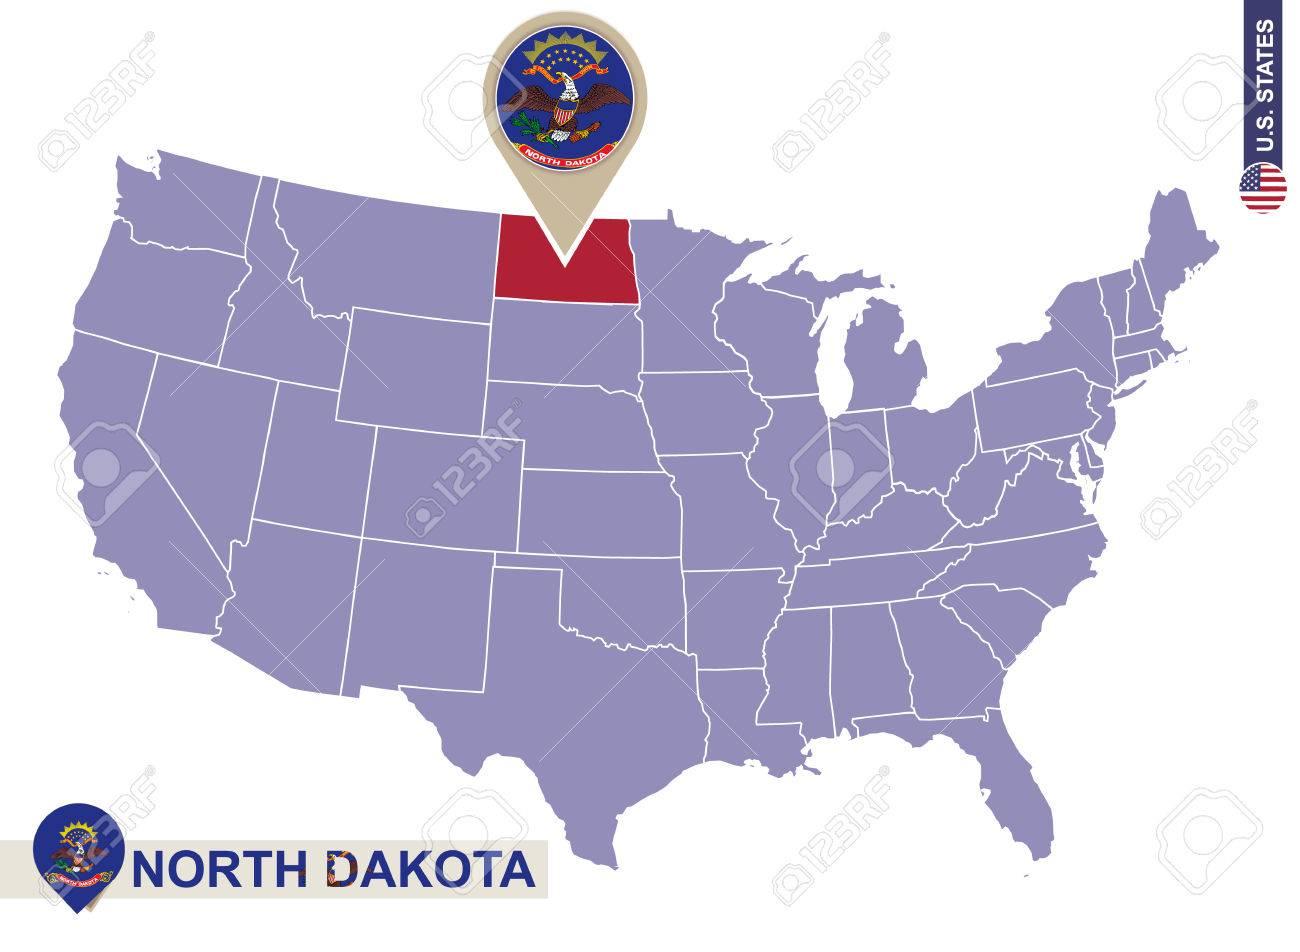 North Dakota State on USA Map. North Dakota flag and map. US..